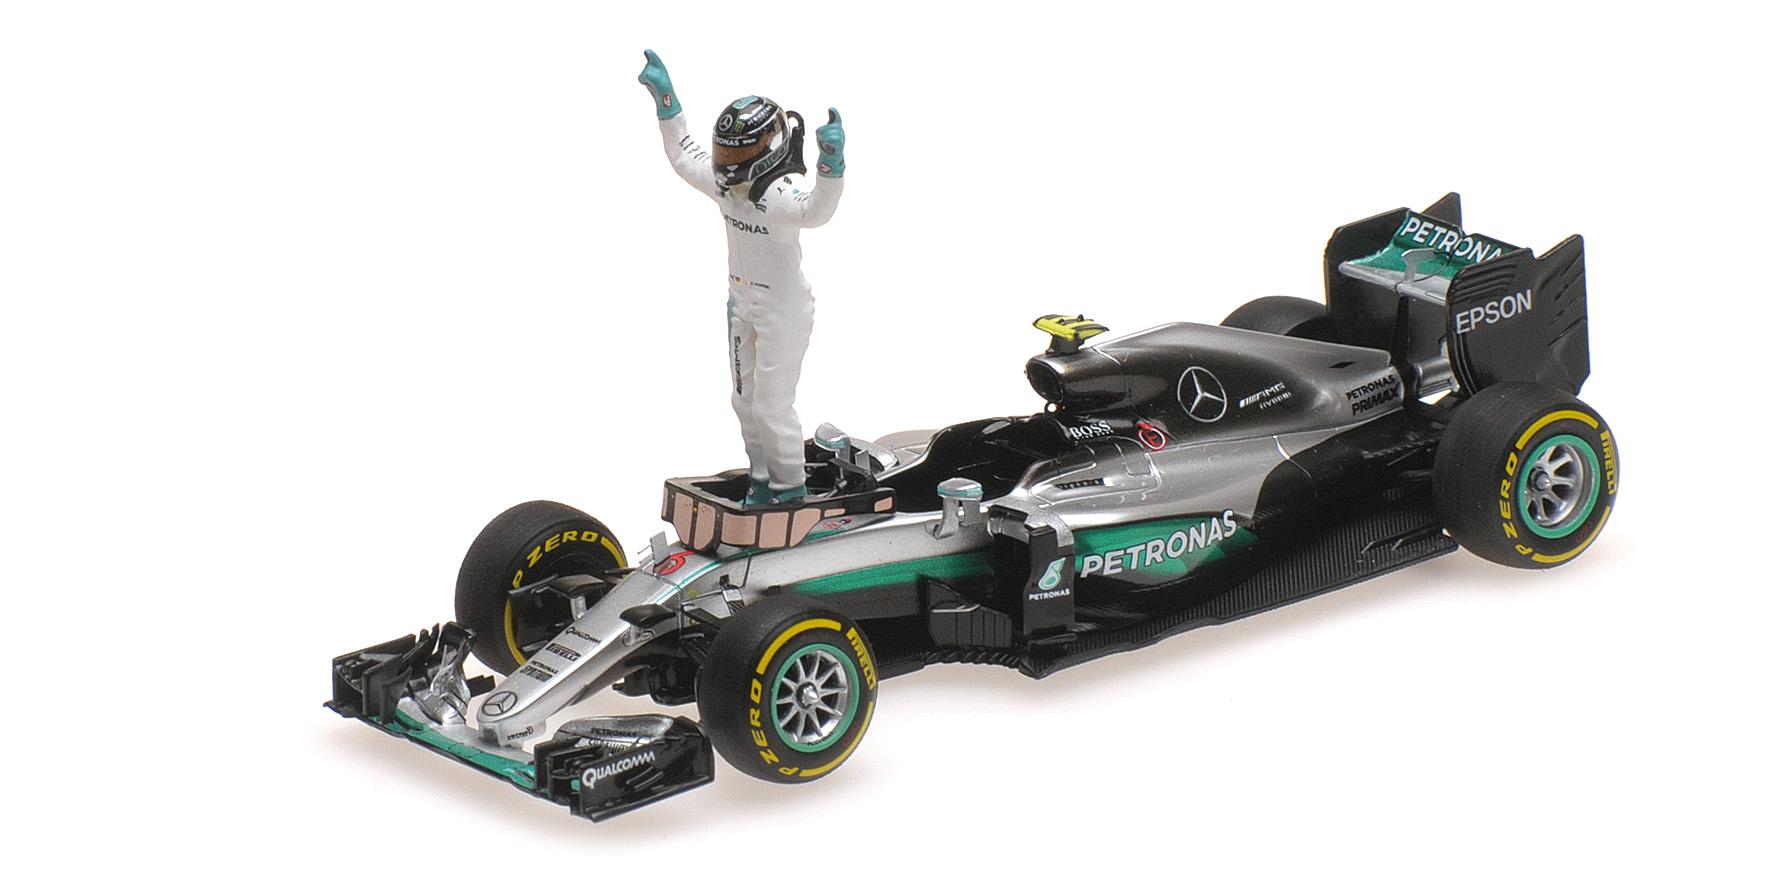 MERCEDES W07 HYBRID NICO ROSBERG WITH FIGURINE WORLD CHAMPION F1 2016 Minichamps